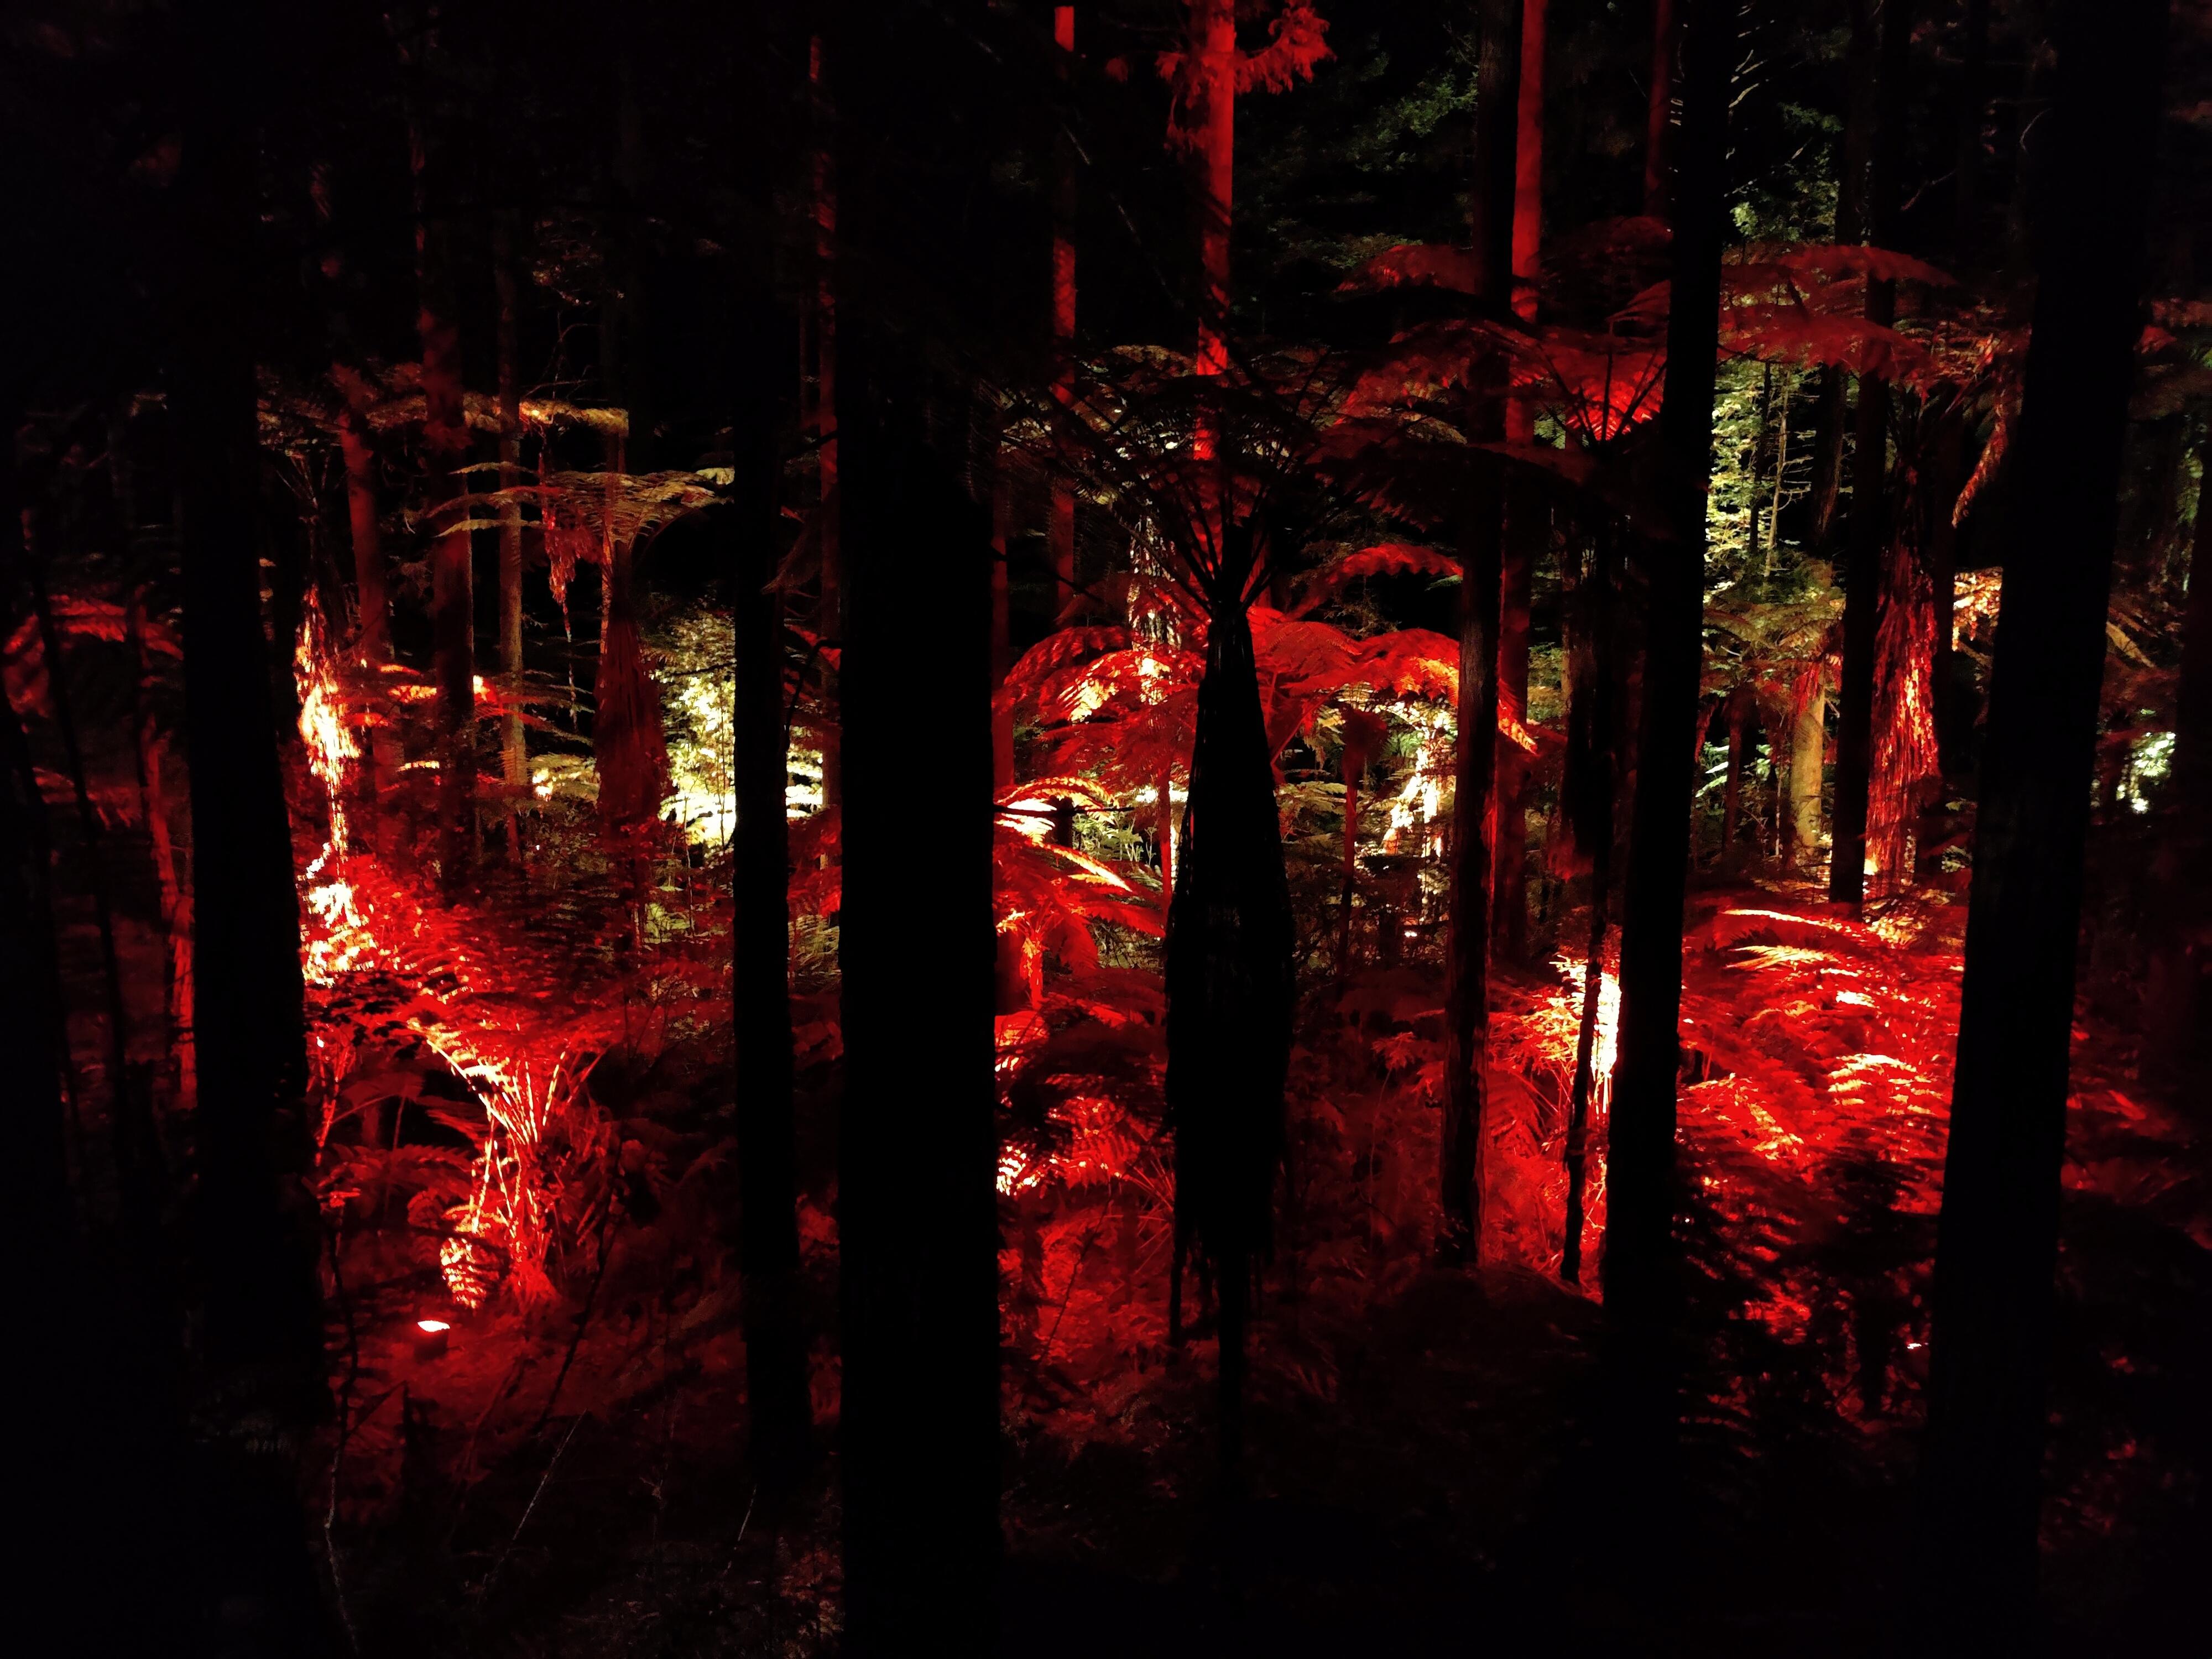 Changing lights from the Rotorua Redwoods Treewalk at night